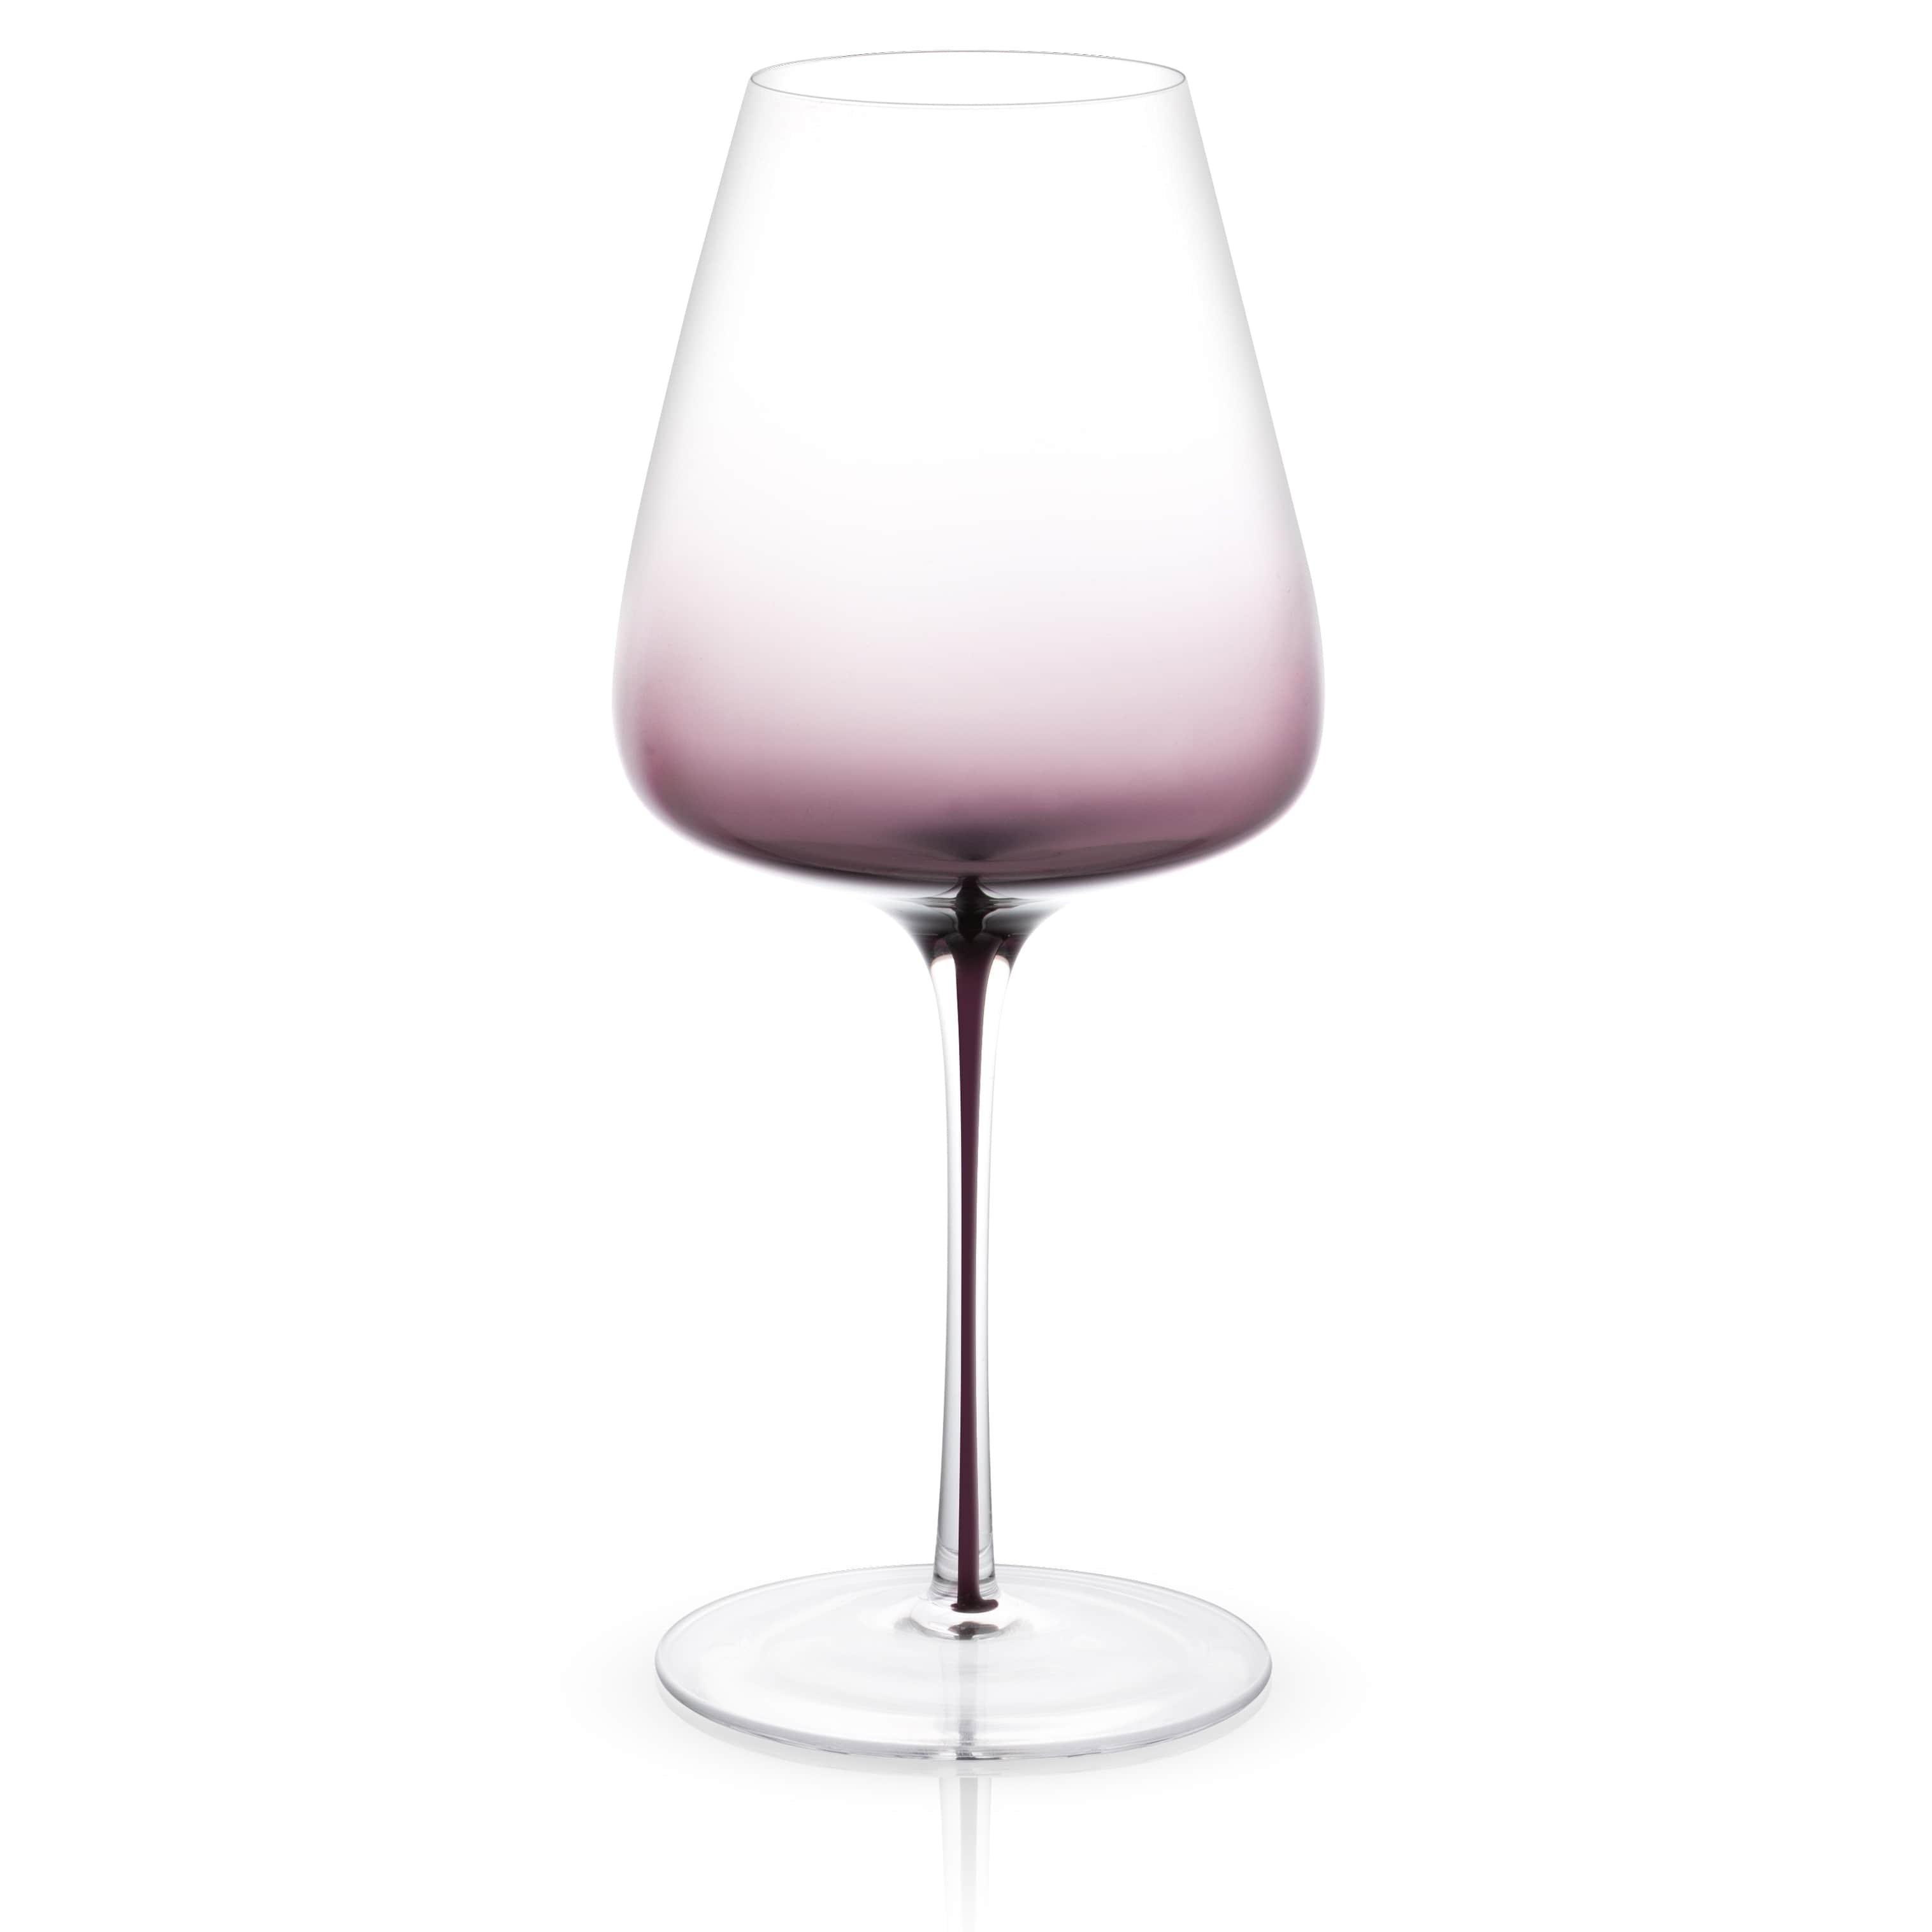 JoyJolt Black Swan Red Wine Glasses Set of two 26.8 Oz